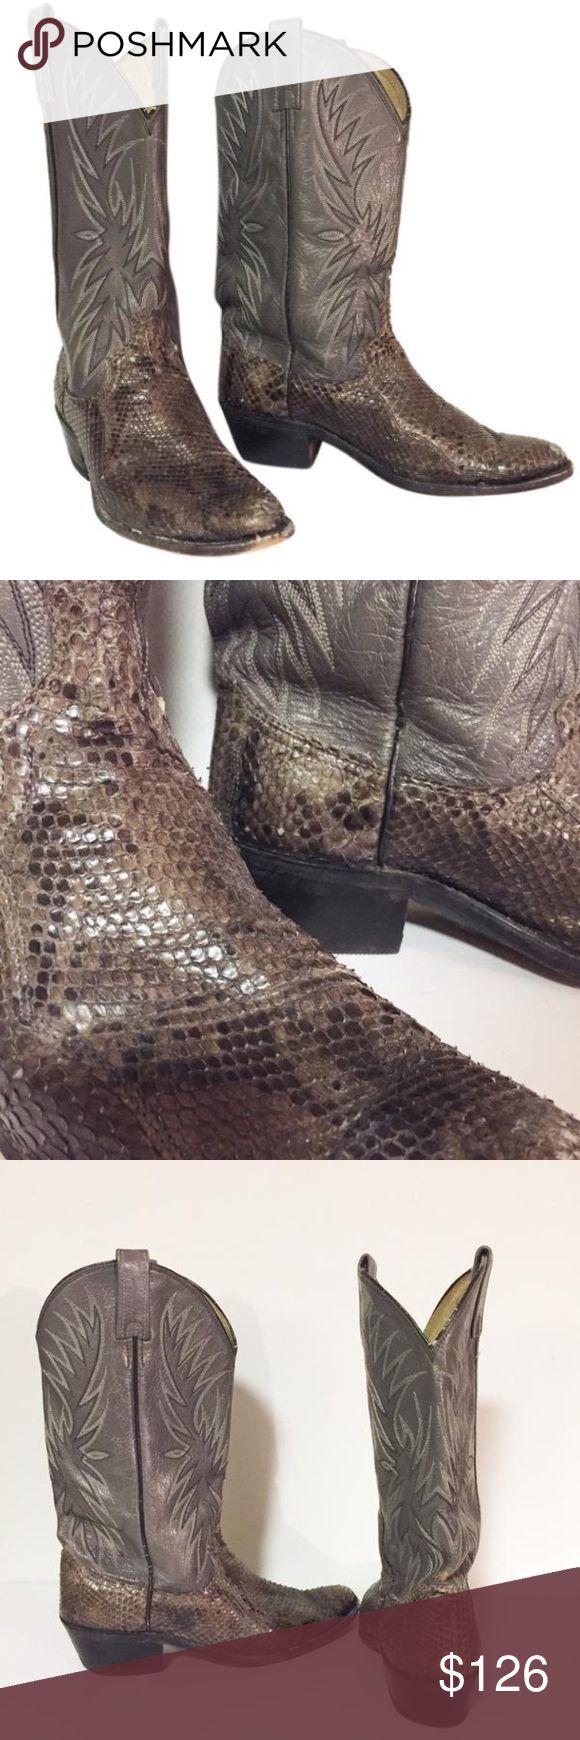 Dan Post snakeskin leather cowboy boots dan post made in USA snakeskin cowboy boots Dan Post Shoes Heeled Boots